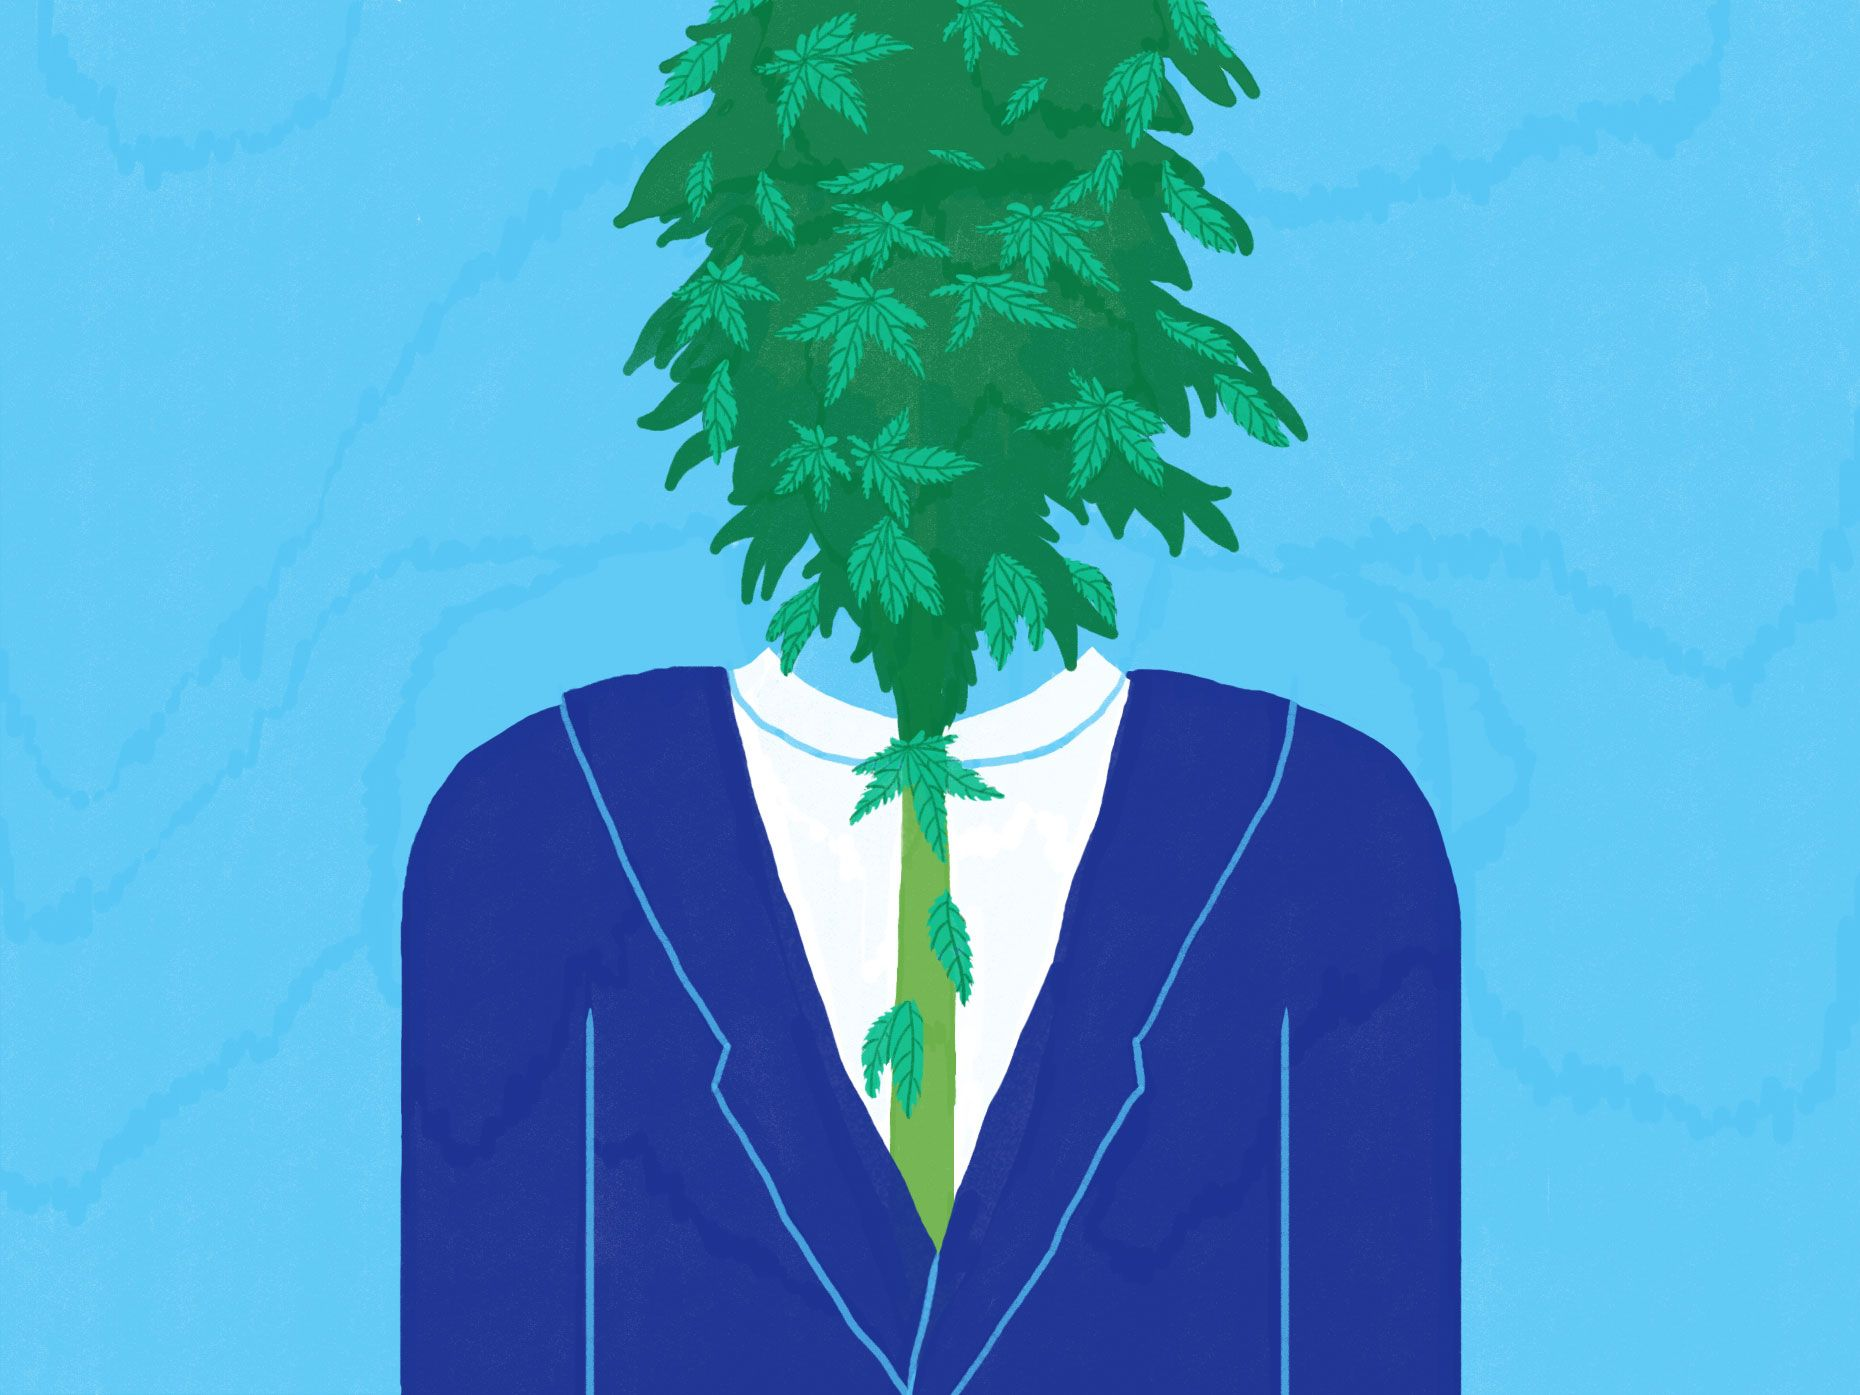 Illustration for #Futura, Corriere della sera's newsletter.  #sofiasita #itsnicethat #thedesigntip #illustrationage #picture #art #artsy #creative #illustration #instaartist #digitalartist #digitalart #artist #digitalpainting #artoftheday #illustrator #creativity #character #art_we_inspire #idea #corrieredellasera #newsletter #cannabis #marijuana #weed #telaviv #israele #design #art #artist #followus #weekend #enjoy #swag